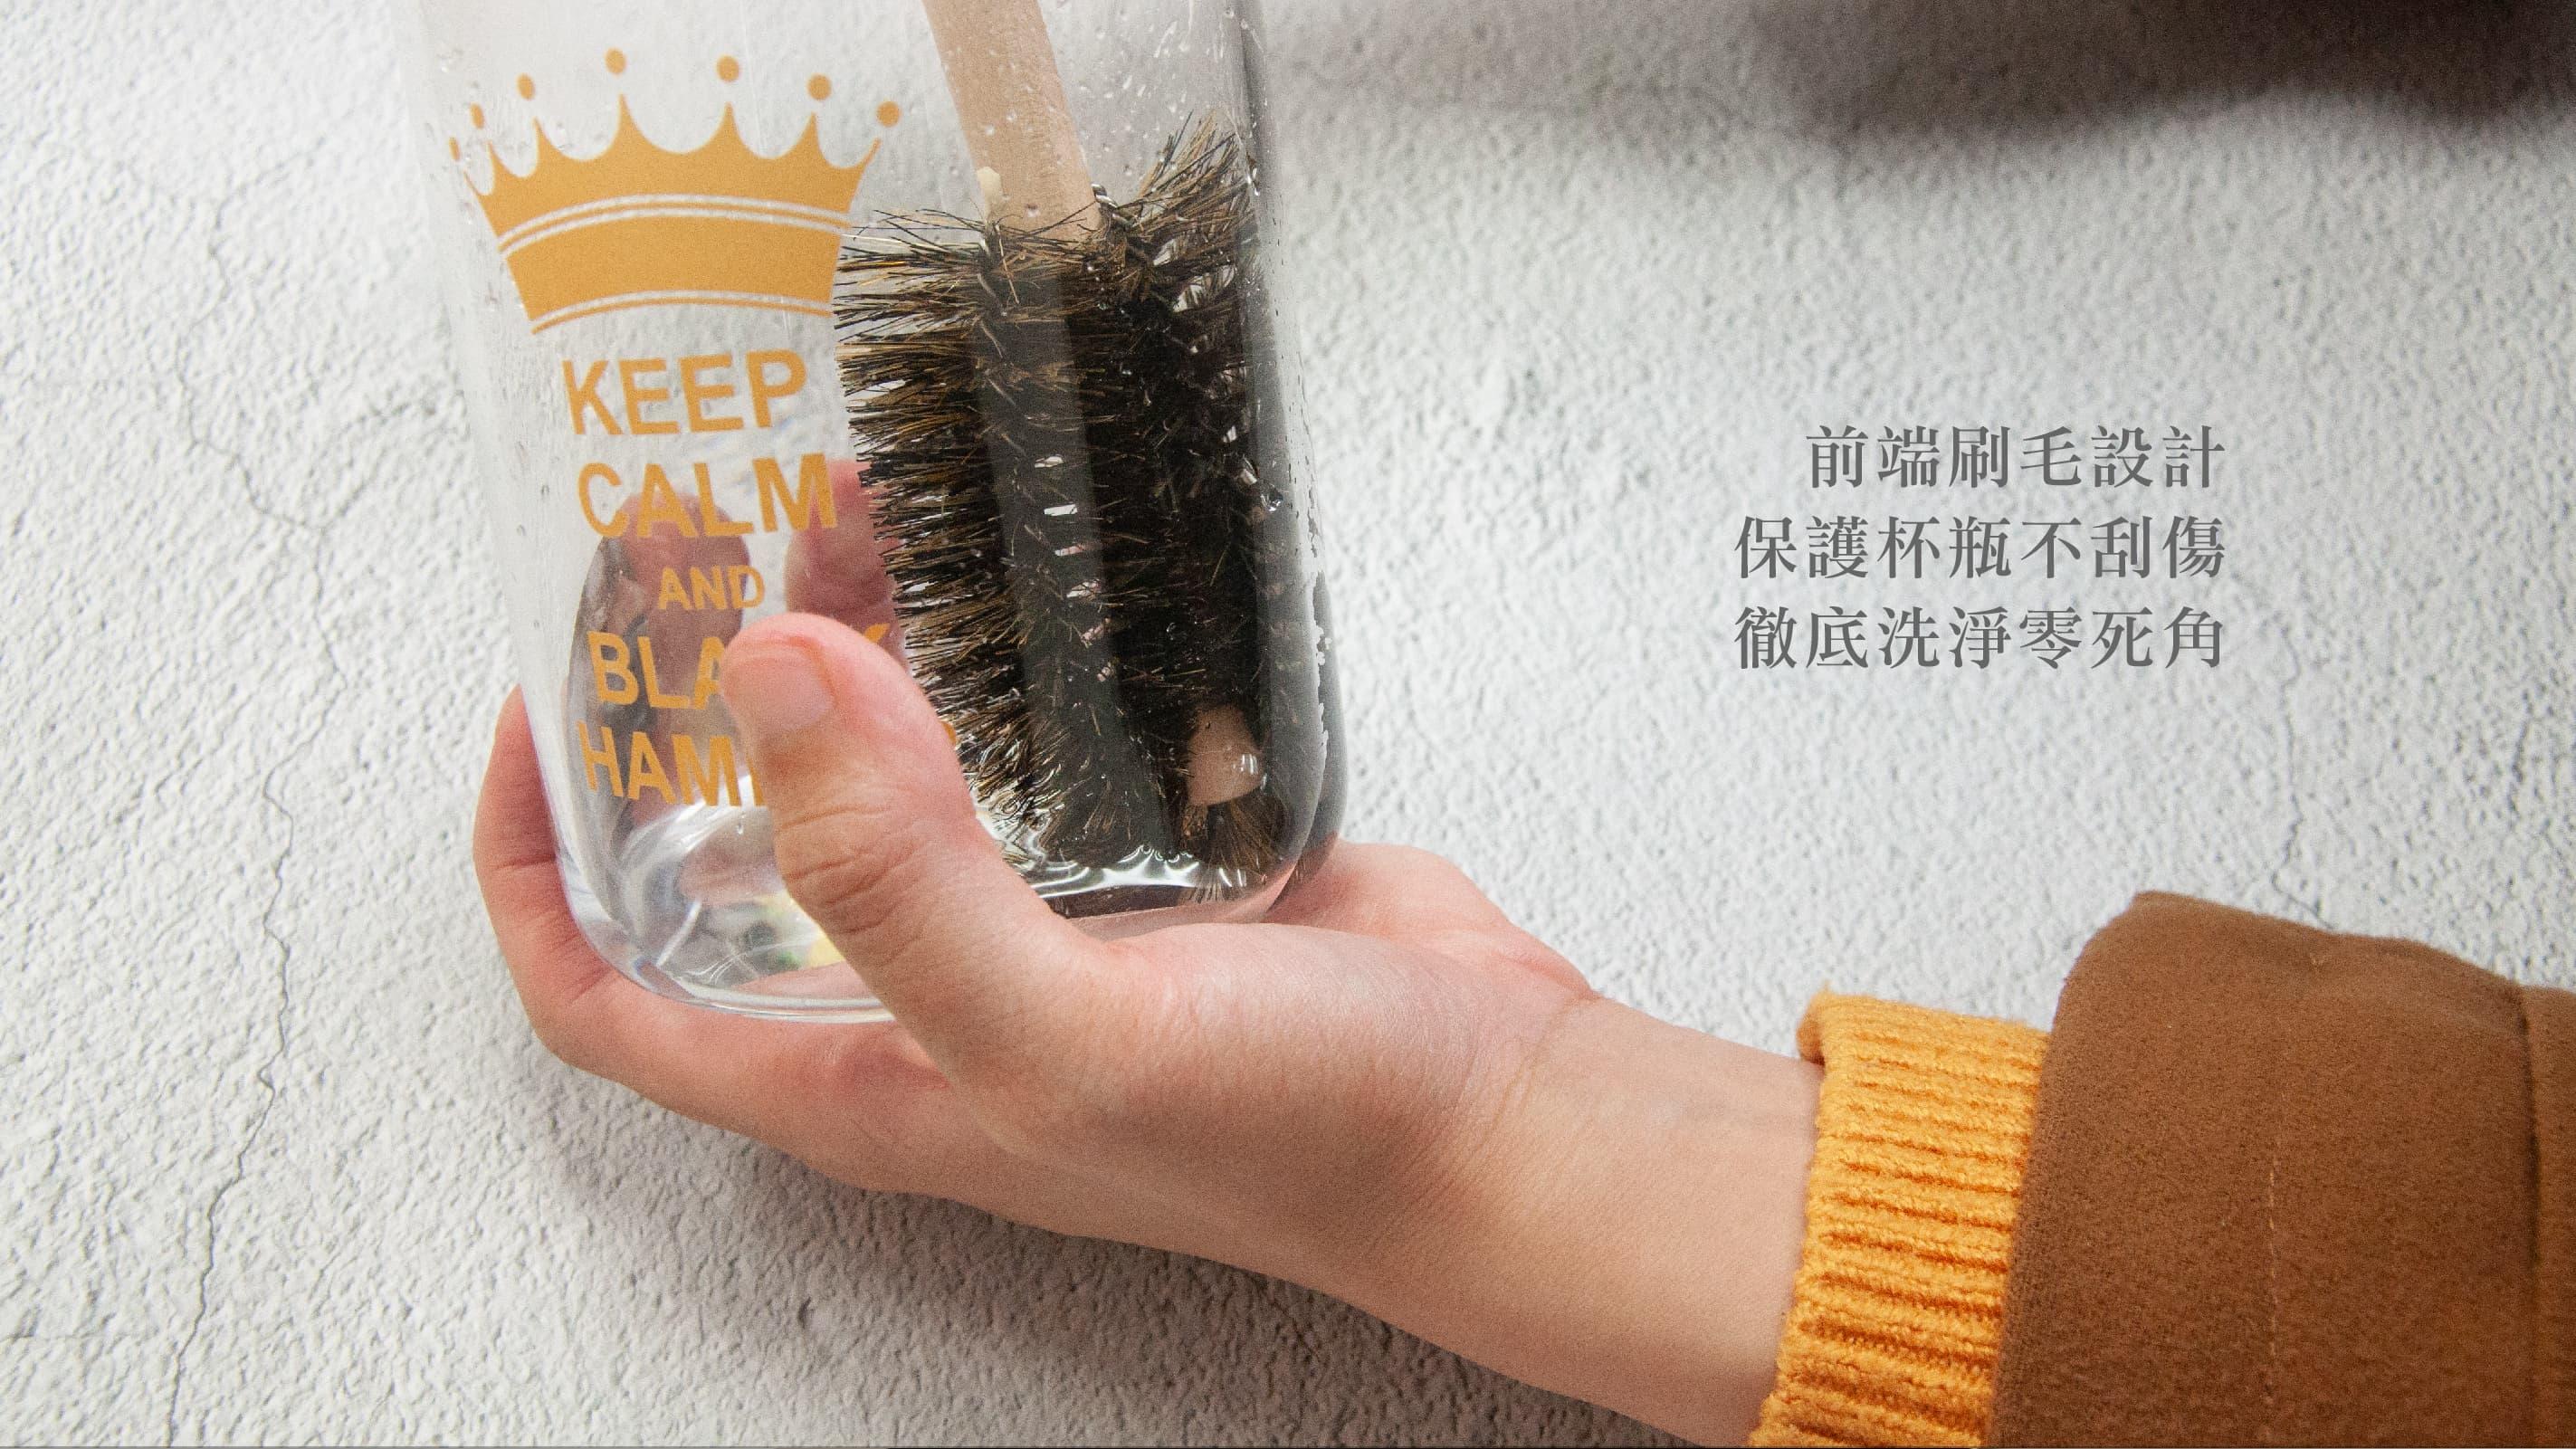 DUBBE、瓶刷、杯刷、瓶杯刷、保溫瓶、奶瓶